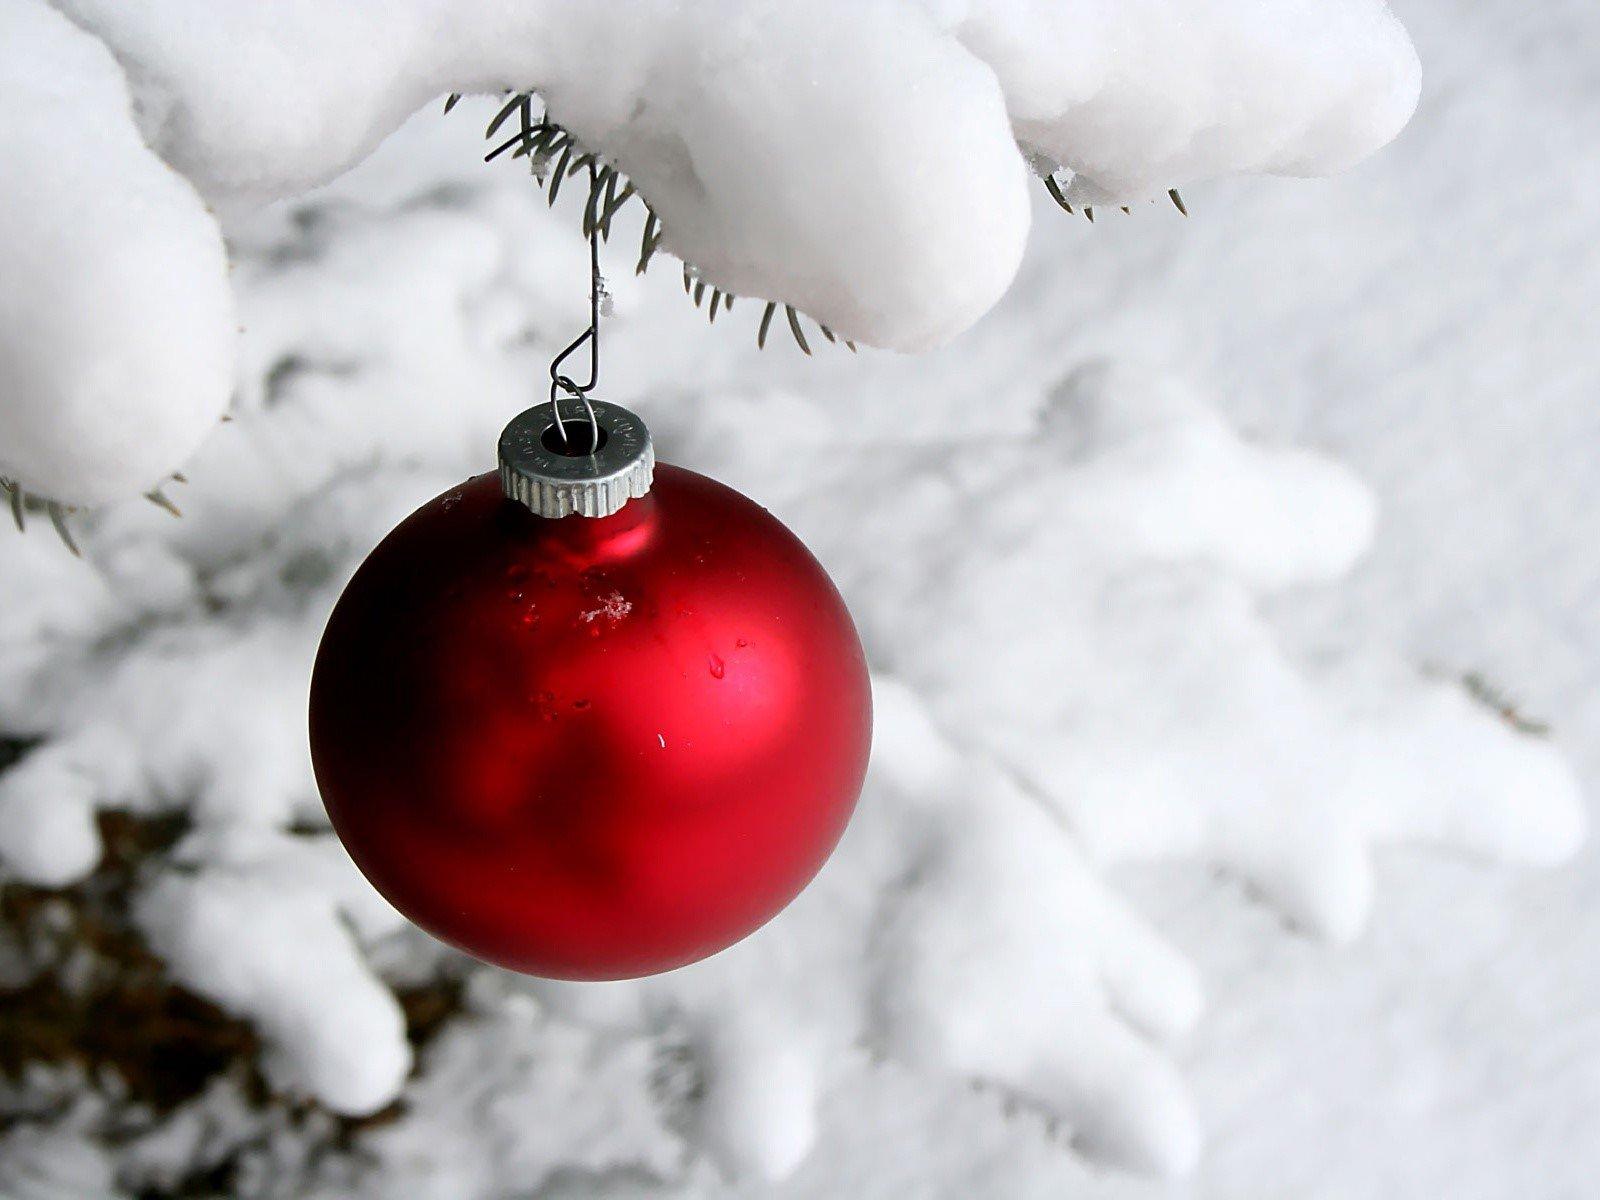 Wallpaper Sphere in snow